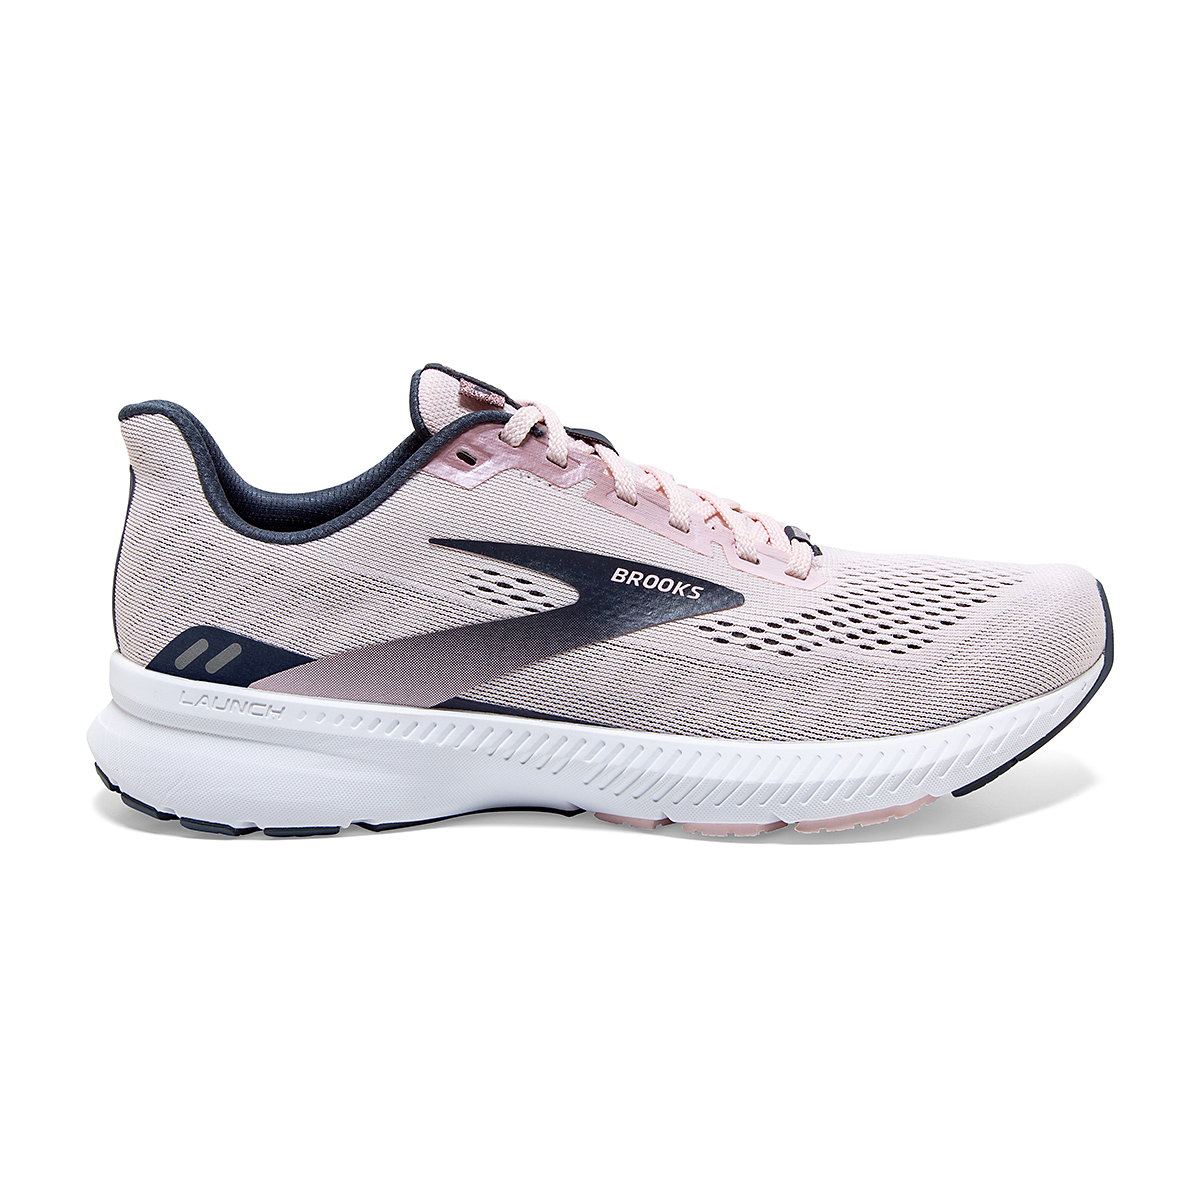 Women's Brooks Launch 8 Running Shoe - Color: Primrose/Ombre/Metallic - Size: 5 - Width: Regular, Primrose/Ombre/Metallic, large, image 1